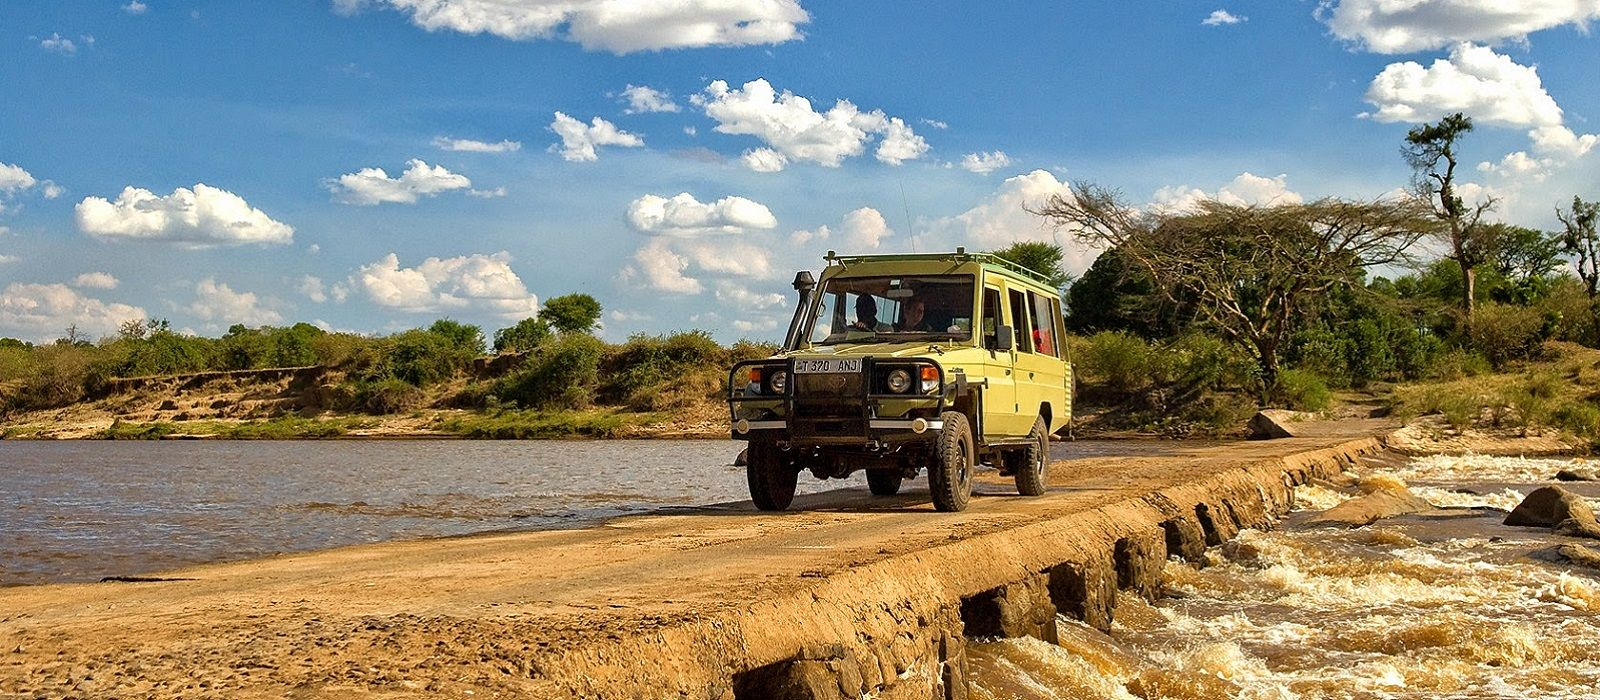 Tanzania, Zimbabwe and Botswana Safari Highlights Tour Trip 3